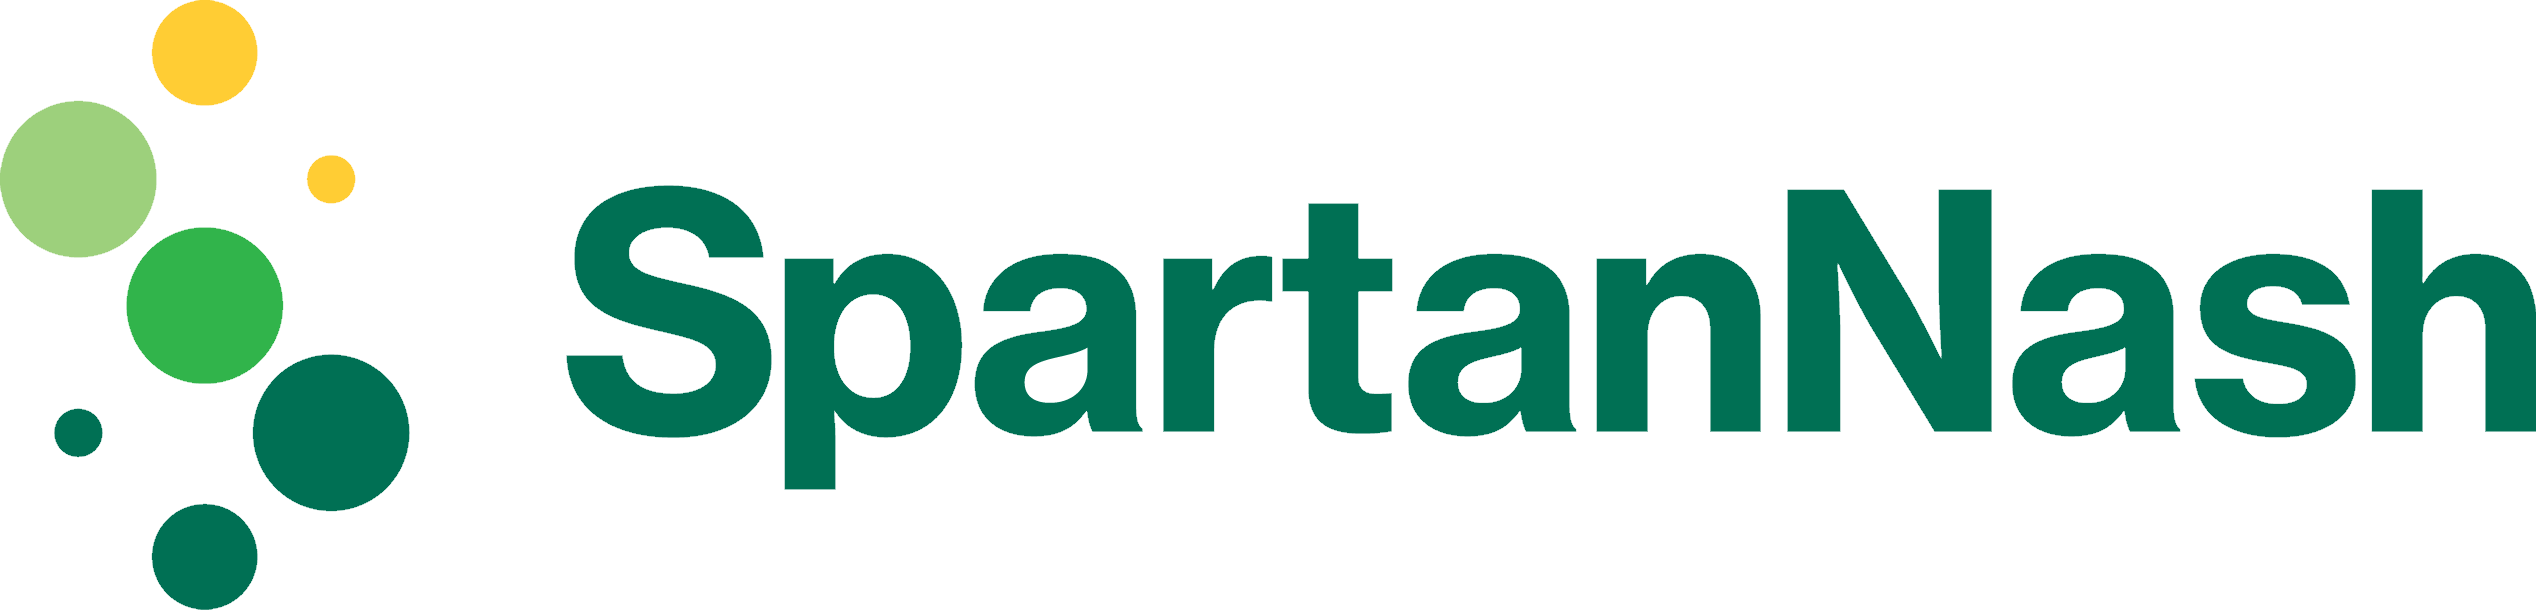 SpartanNash-Company-Logo.png